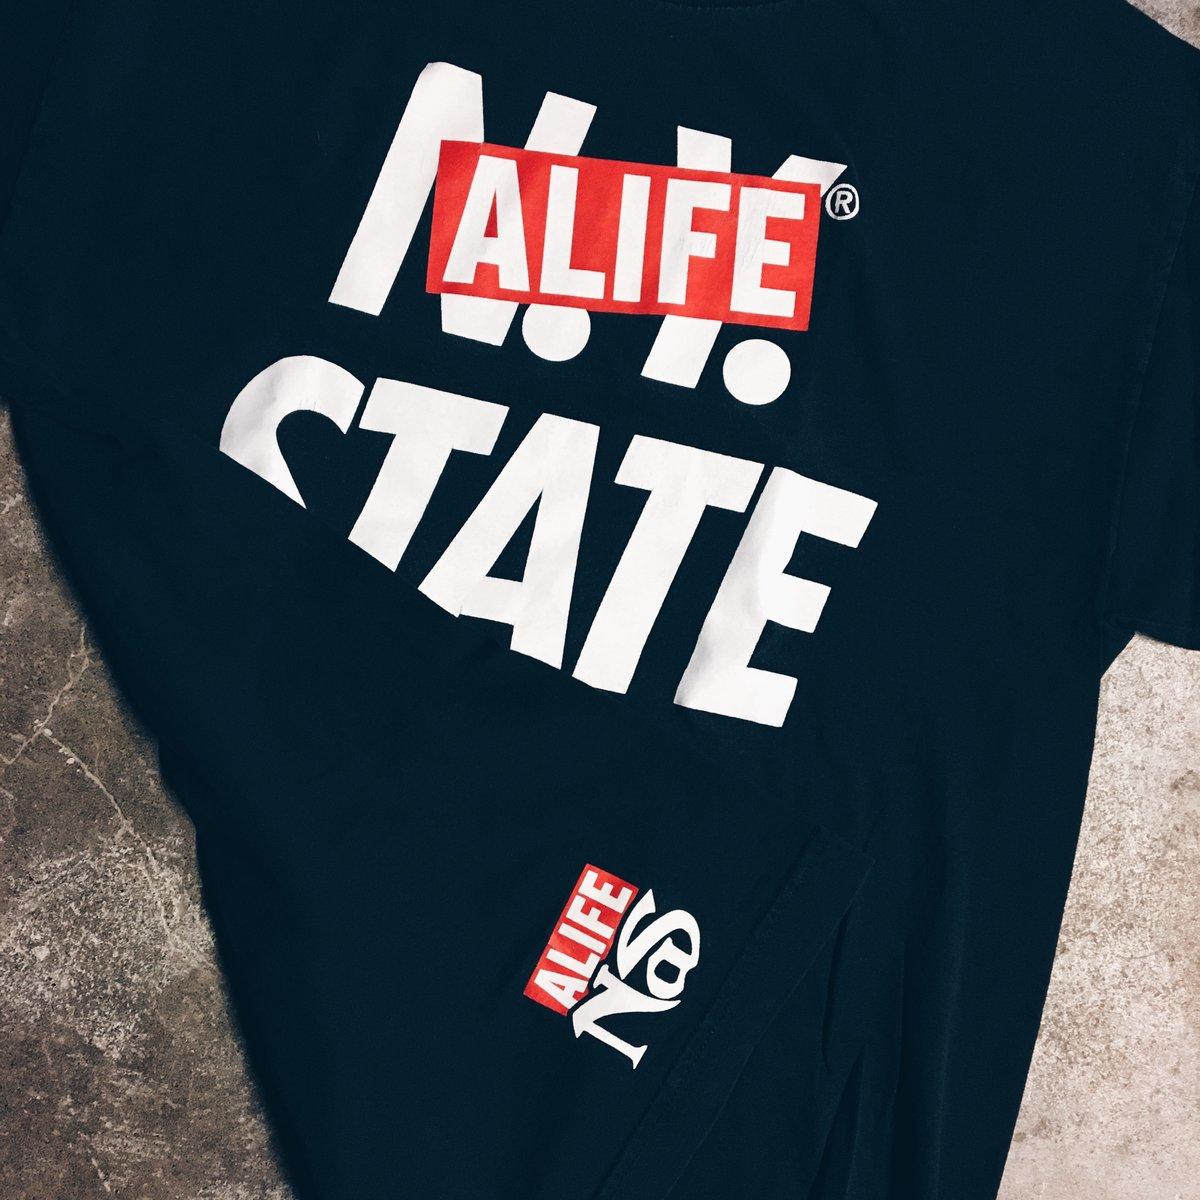 Image of Original 2008 Alife x Nas NYC Exclusive Event Tee.